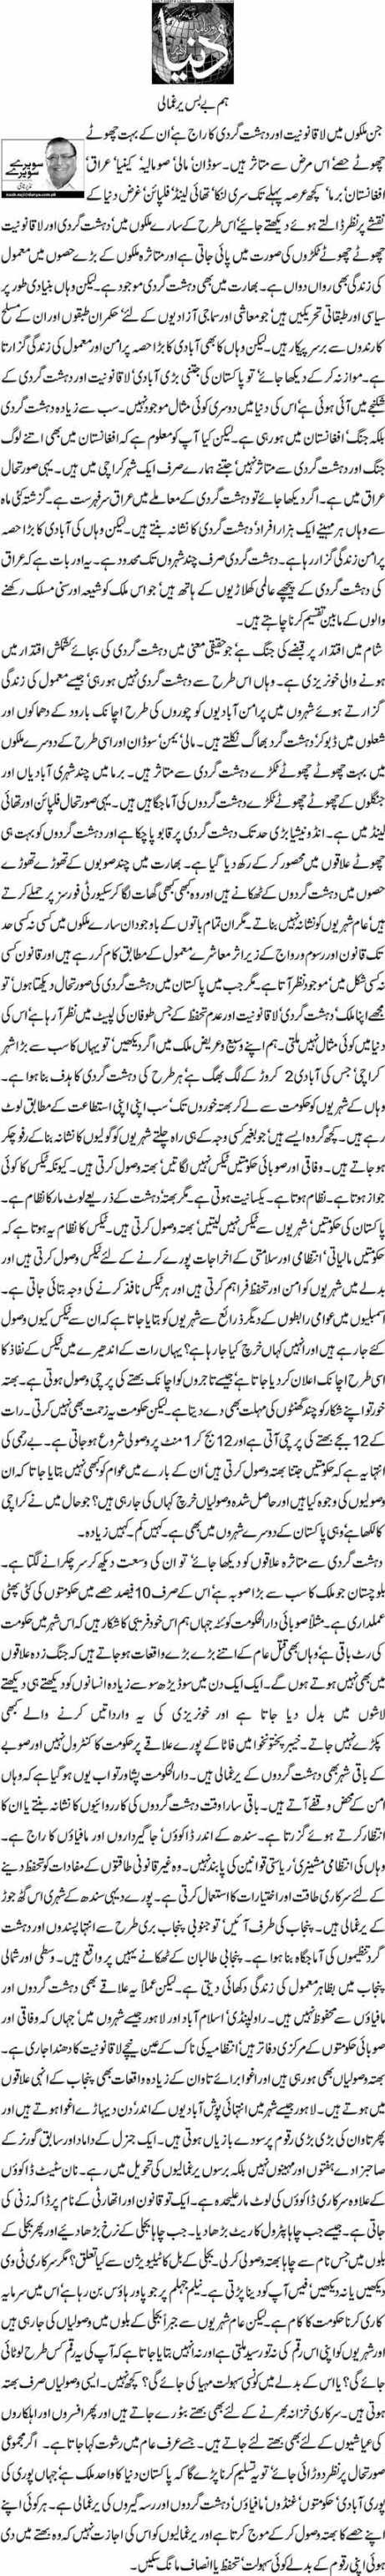 Hum Be Bas Yarghamali - Nazeer Naji